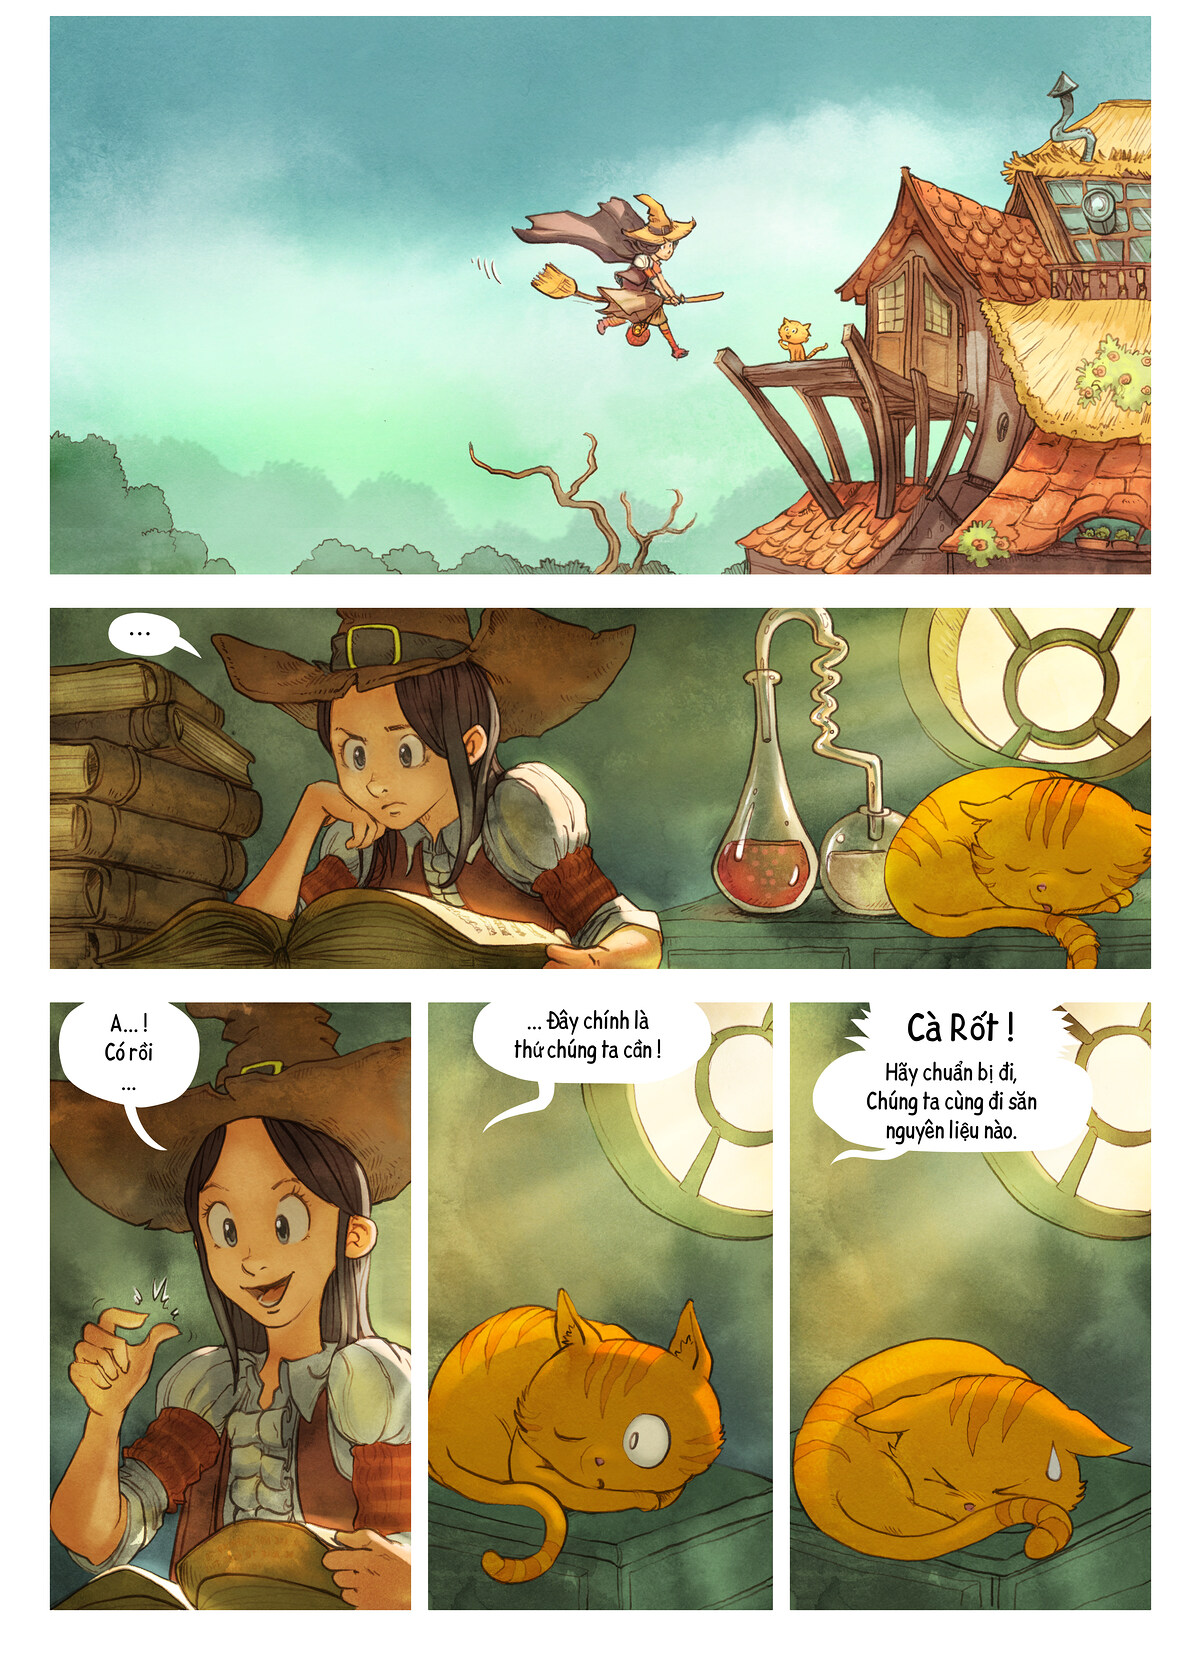 A webcomic page of Pepper&Carrot, Tập 3 [vi], trang 4